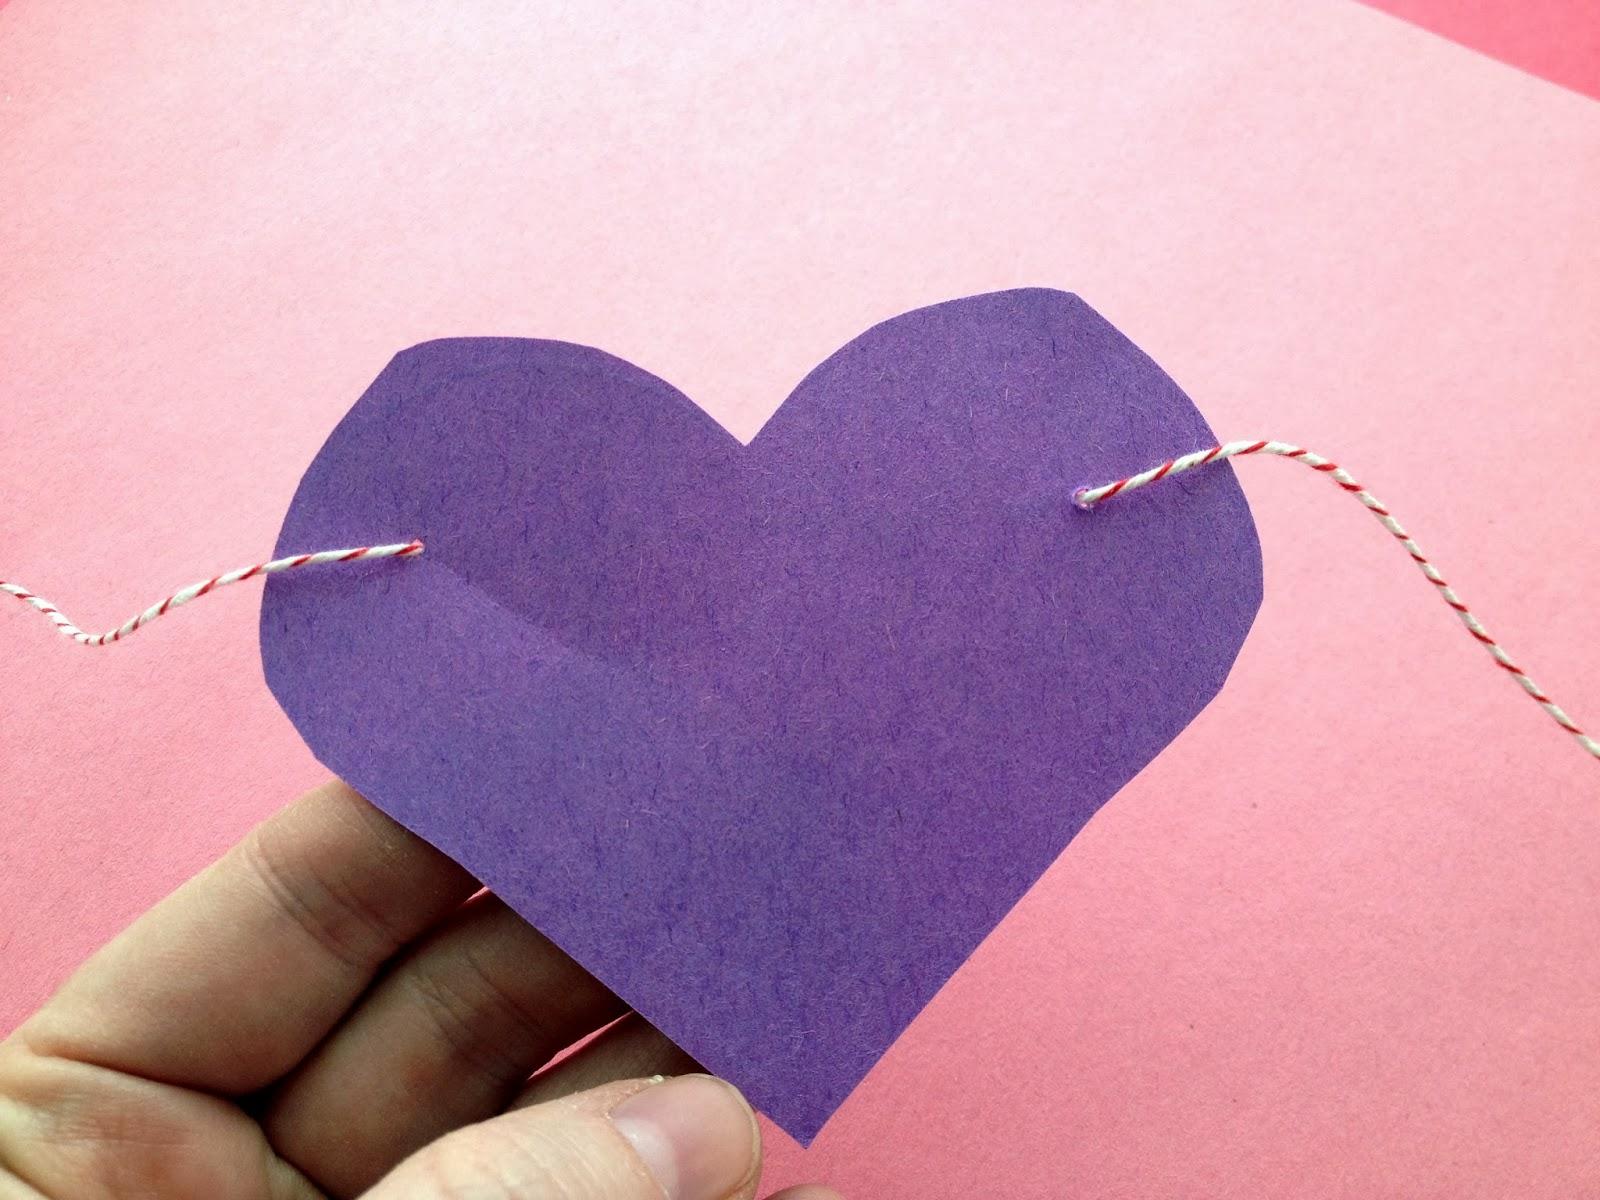 Voice of Reason: DIY Heart Banner